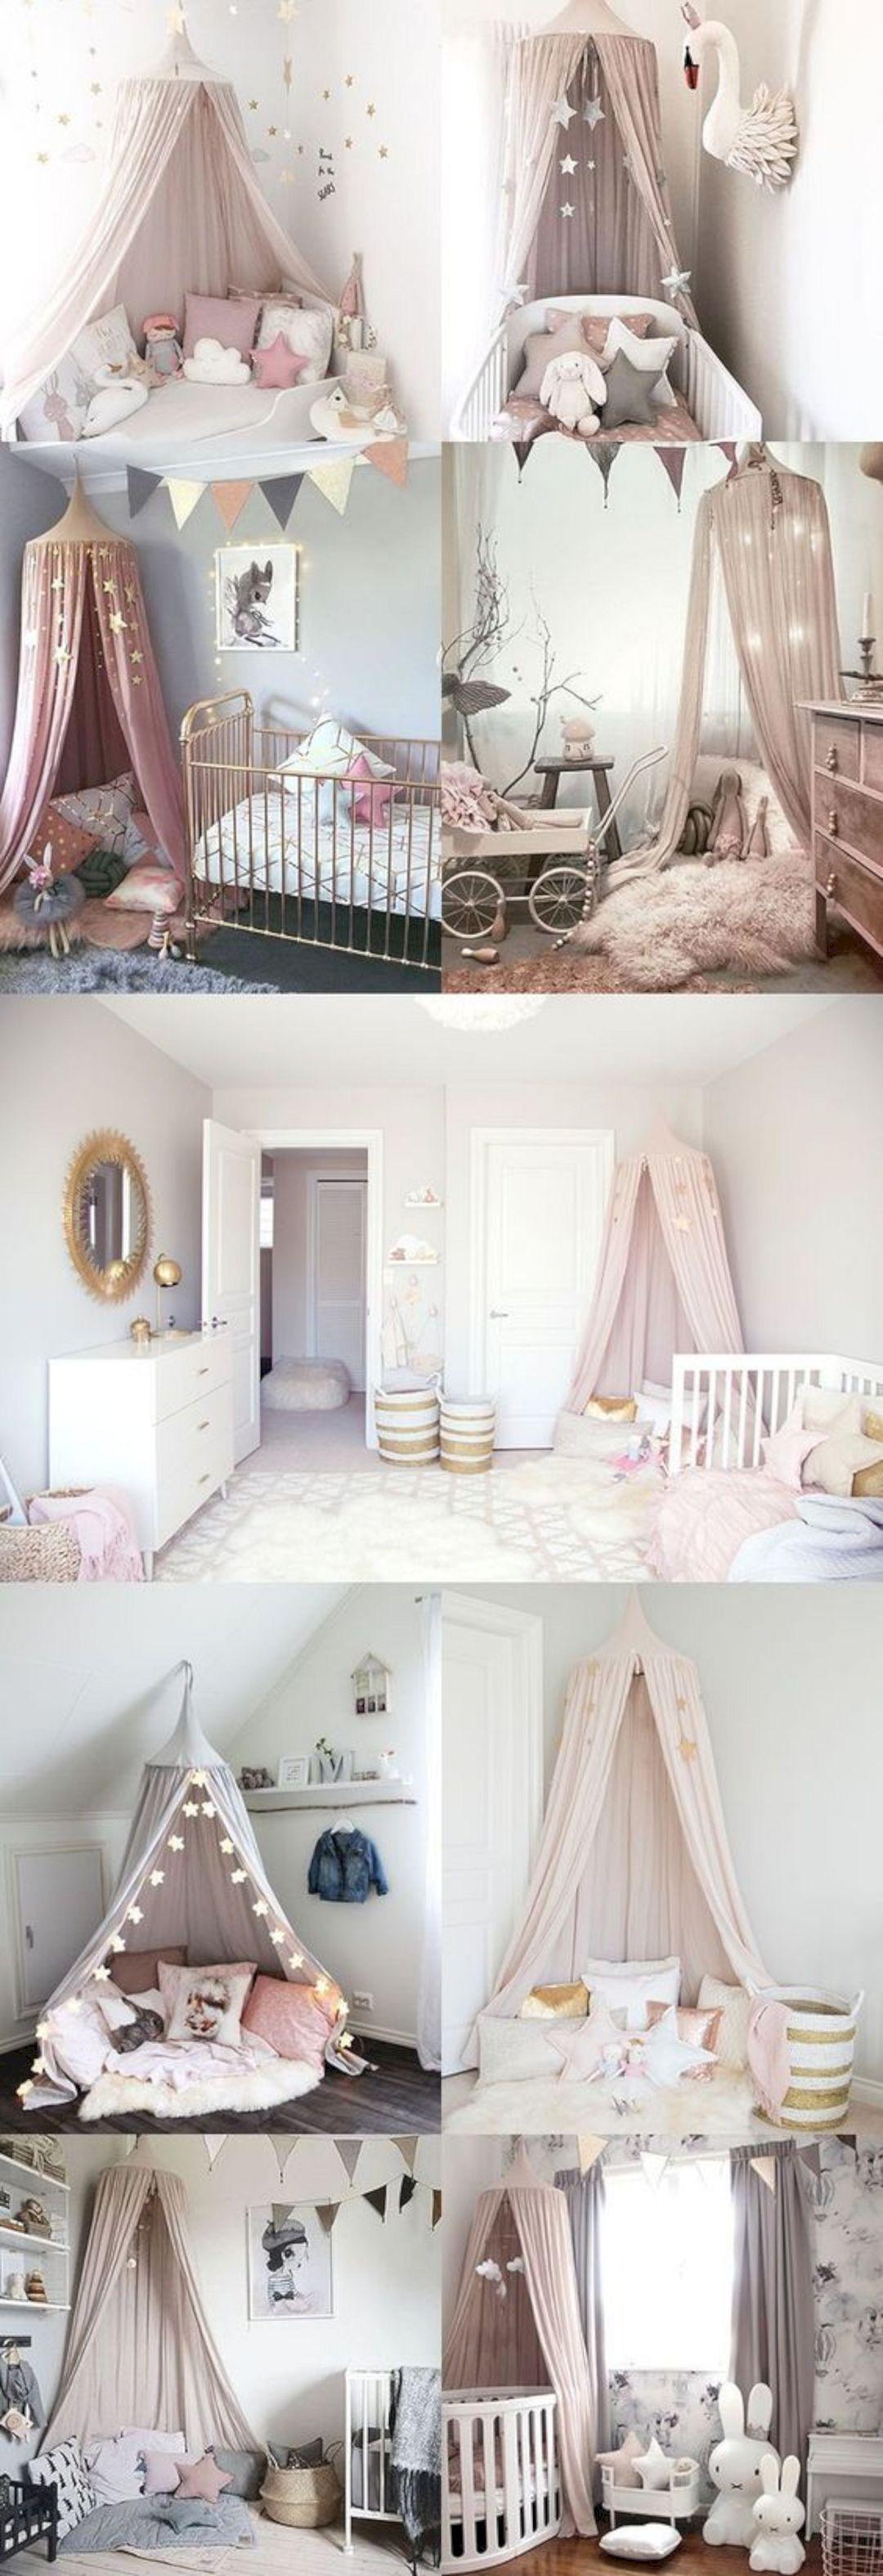 18 DIY Kids Room Decor Ideas